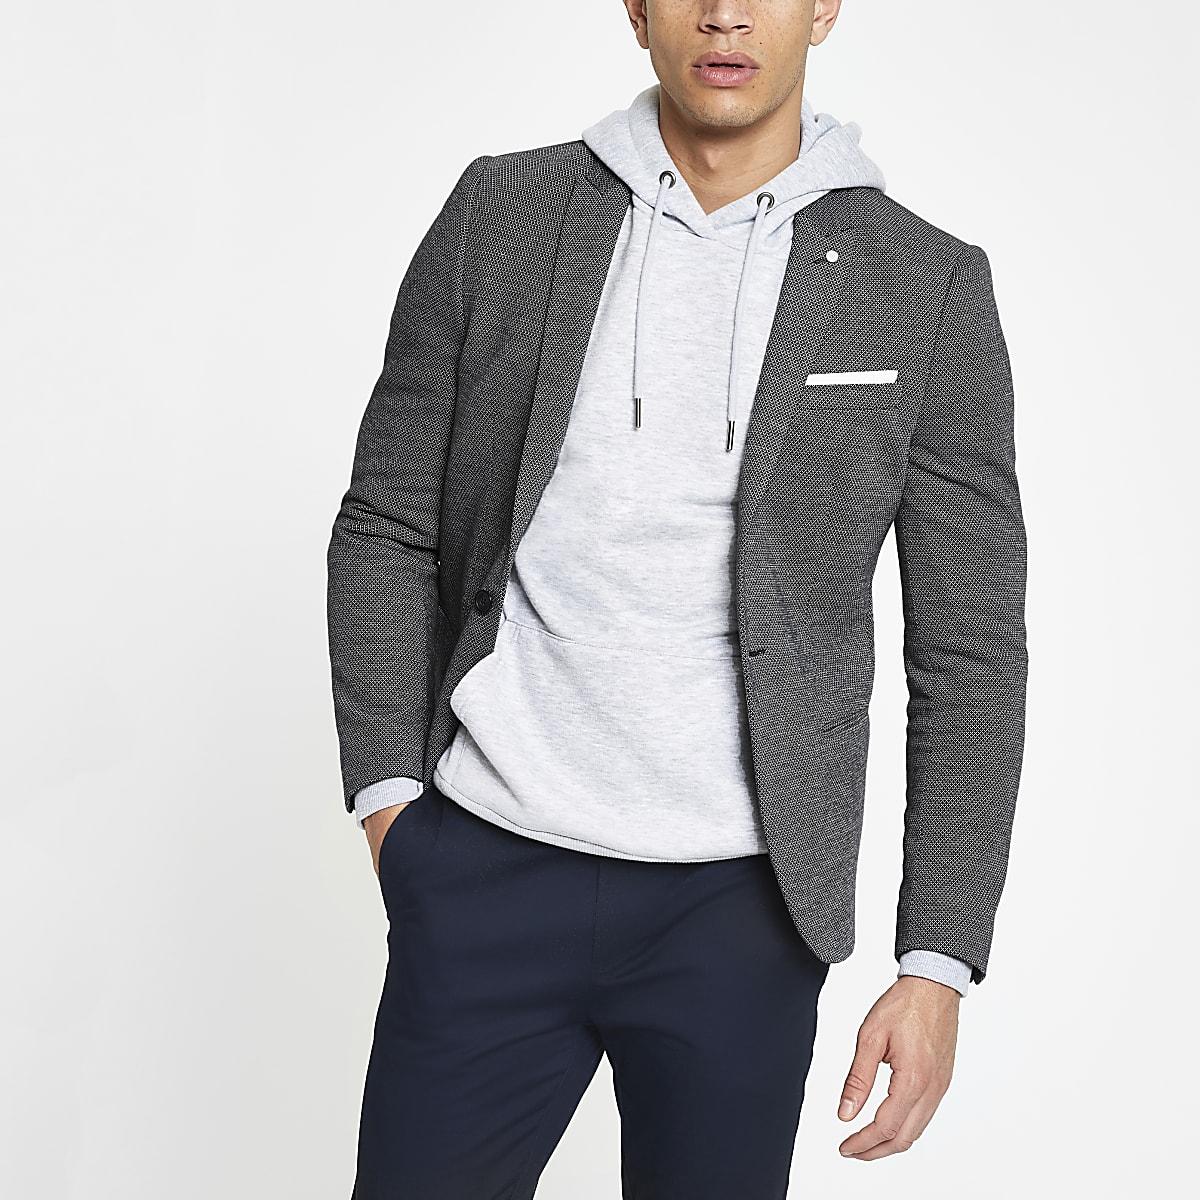 Marineblauer Skinny Fit Blazer